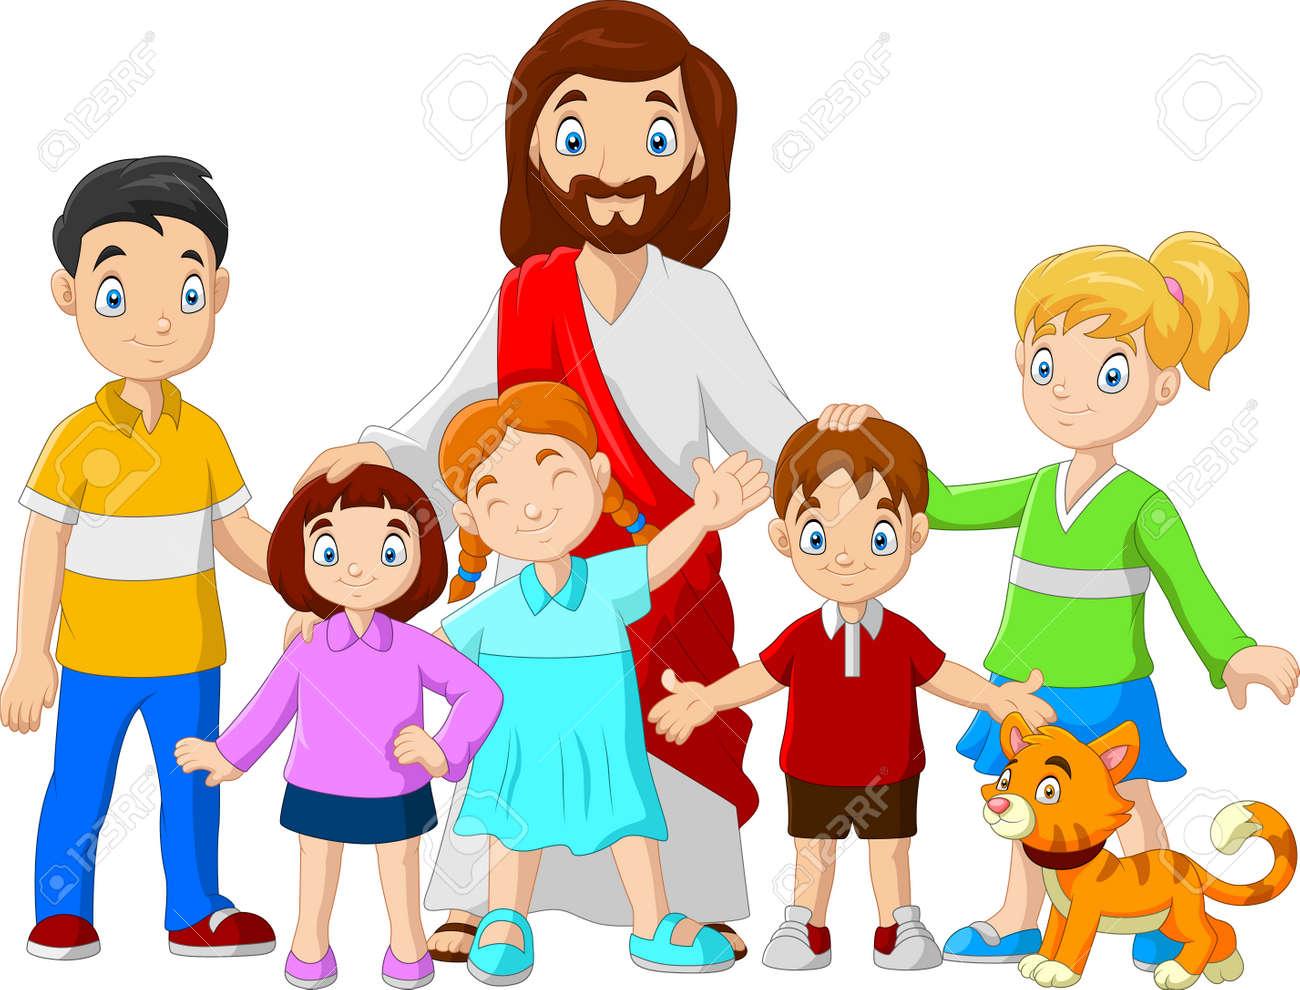 Jesus Background clipart - Boy, Hand, Child, transparent clip art